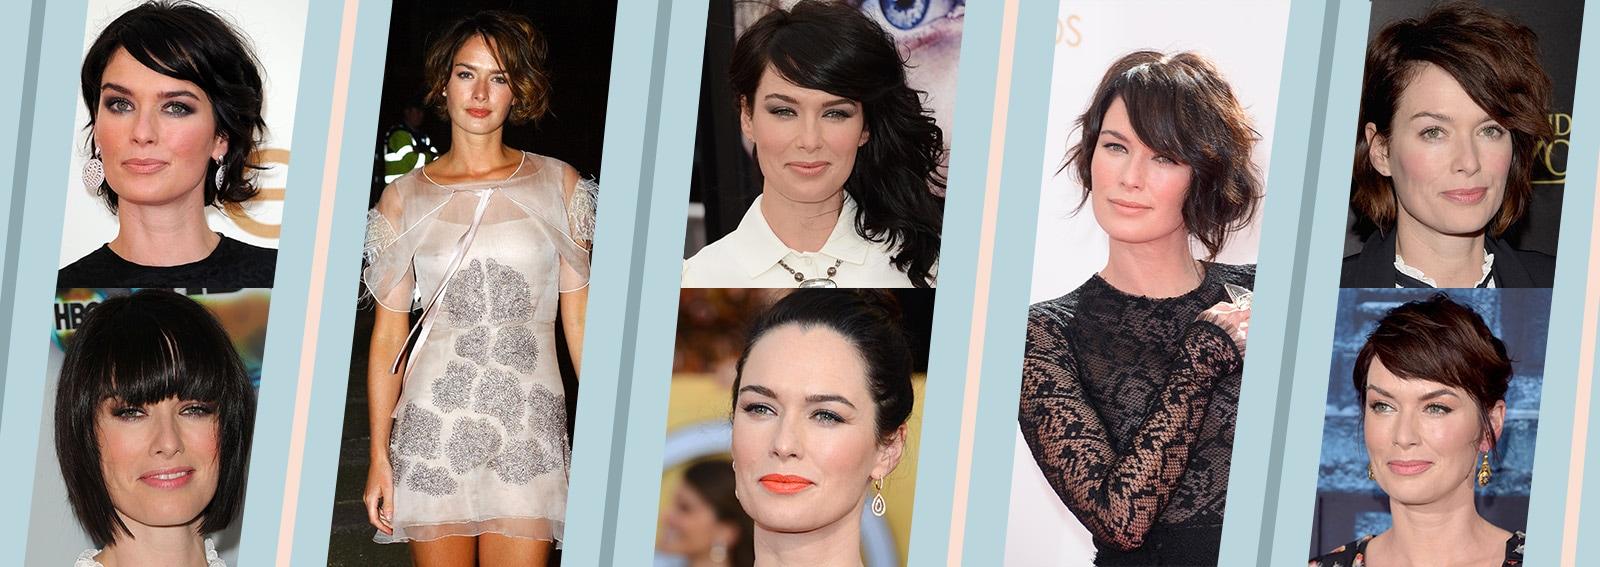 Lena Headey evoluzione beauty look trucco capelli collage_desktop